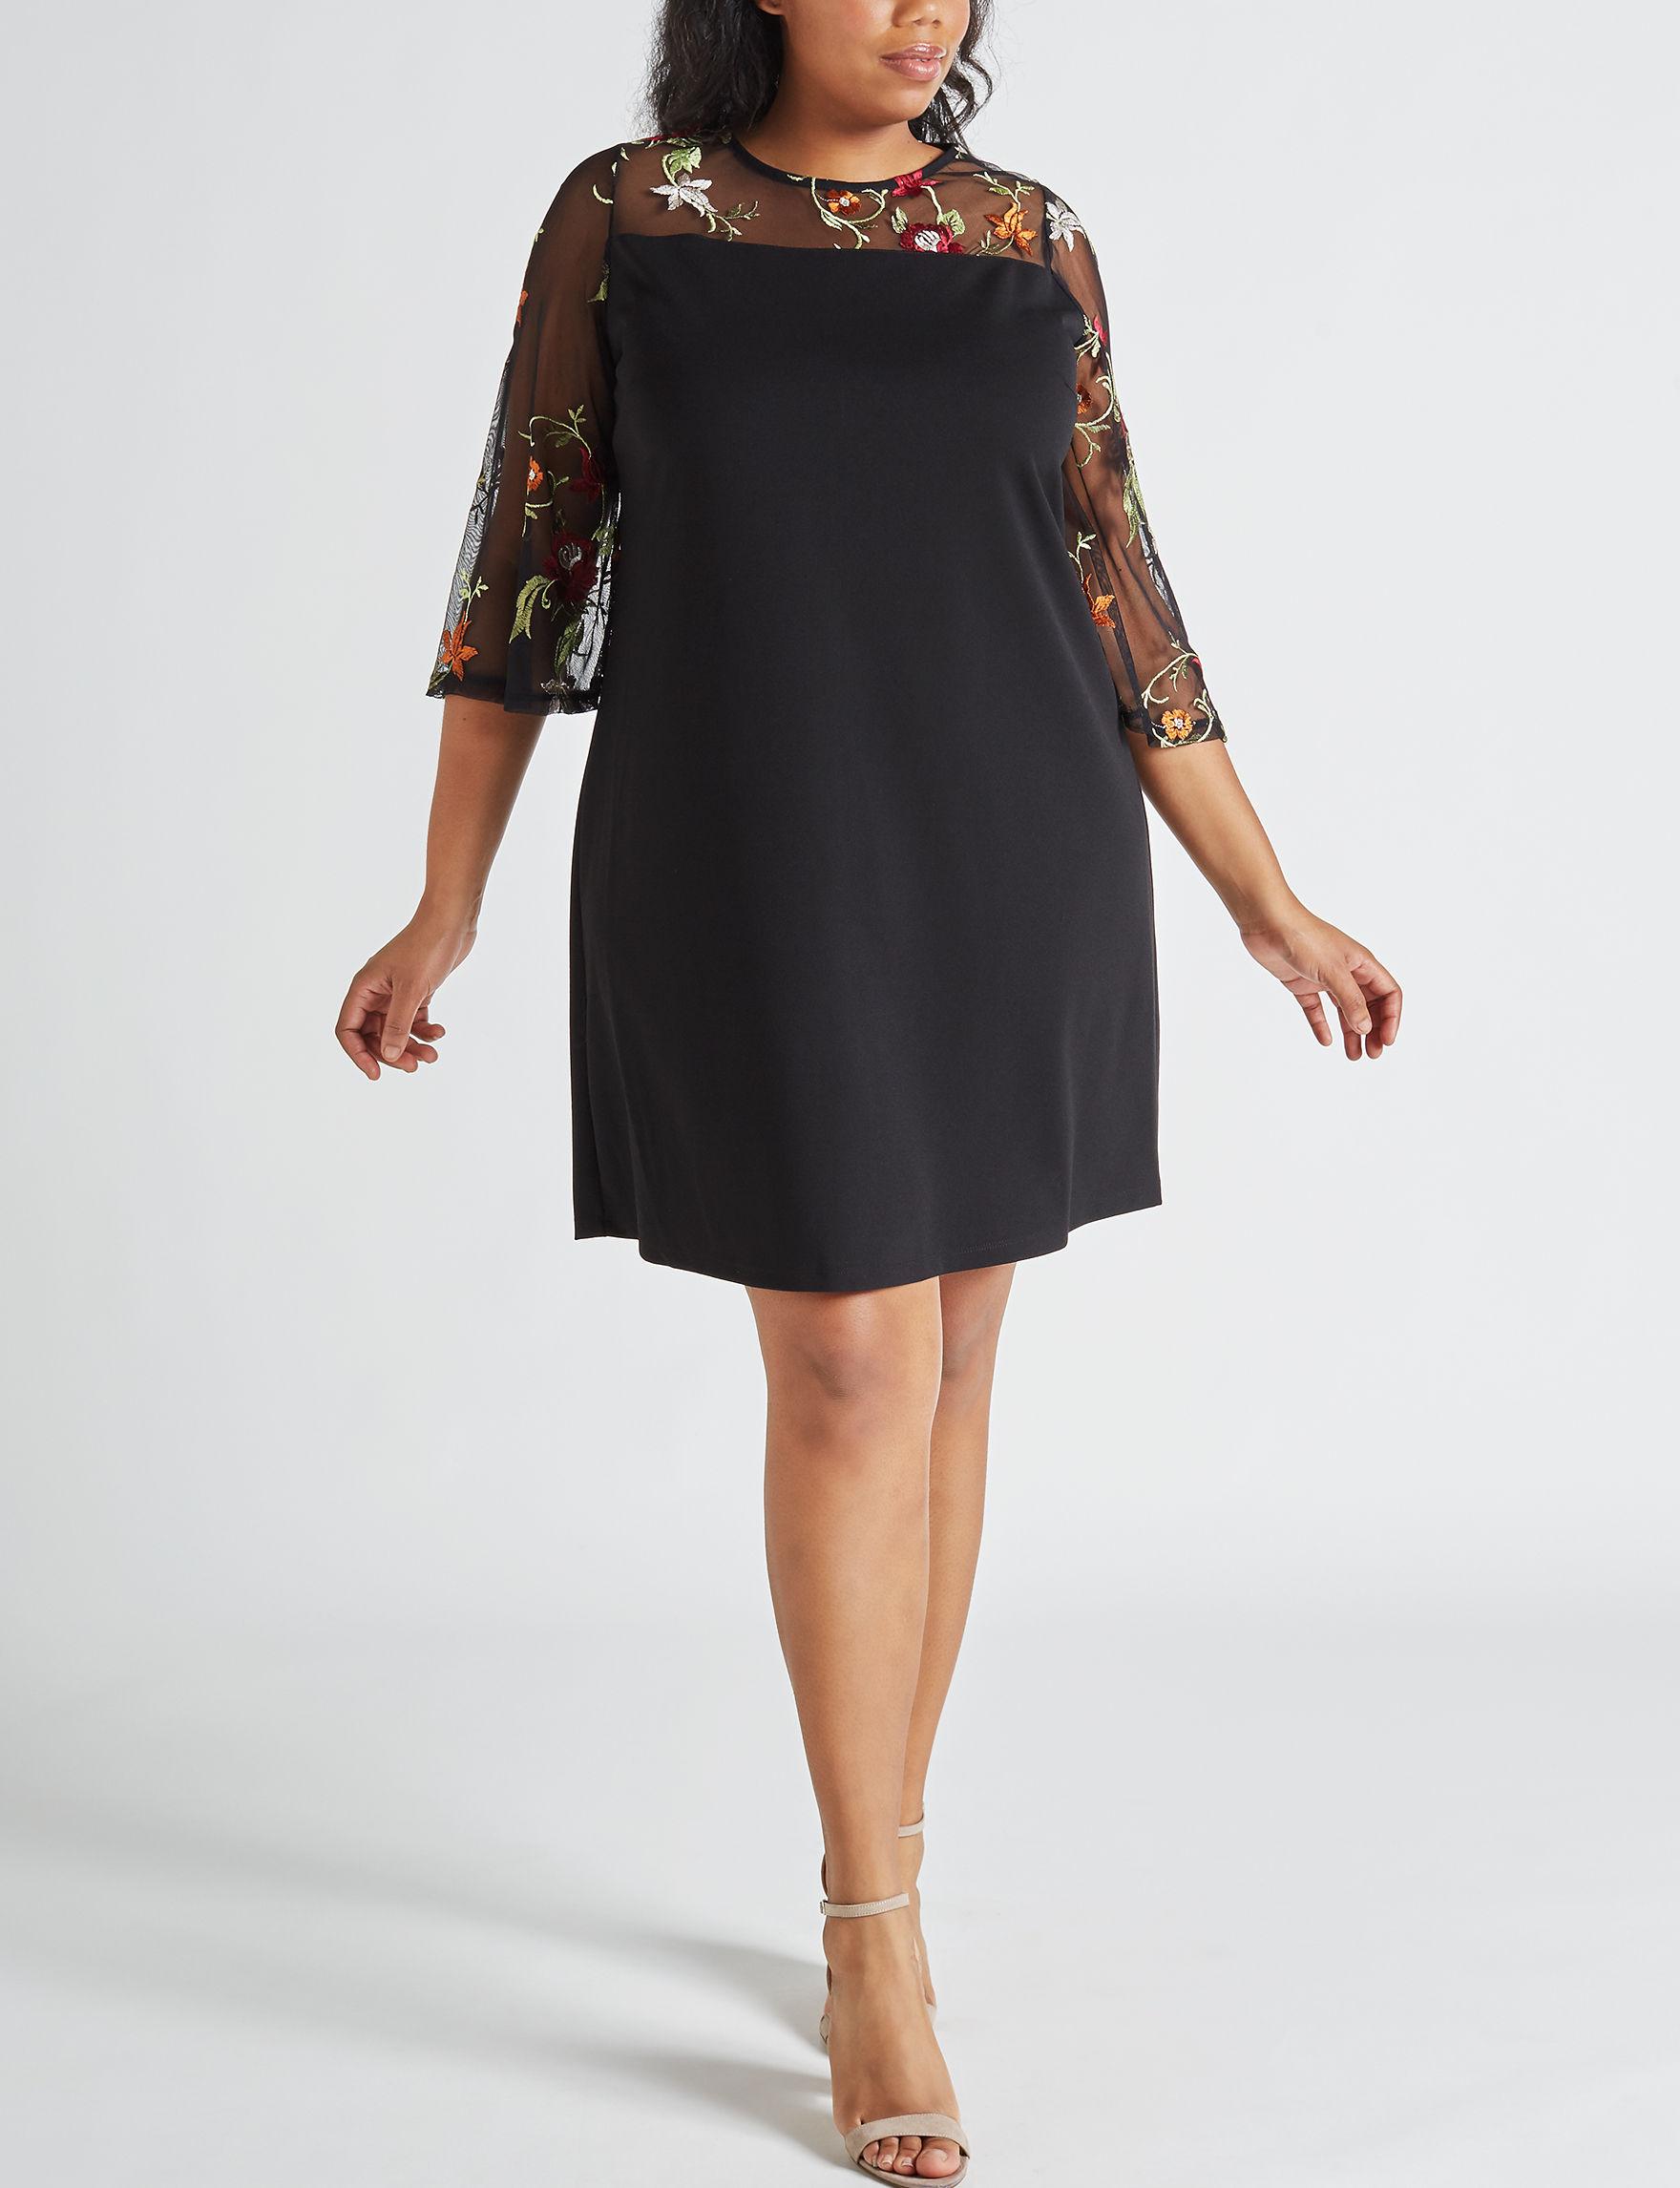 Nina Leonard Black / Multi Everyday & Casual Shift Dresses